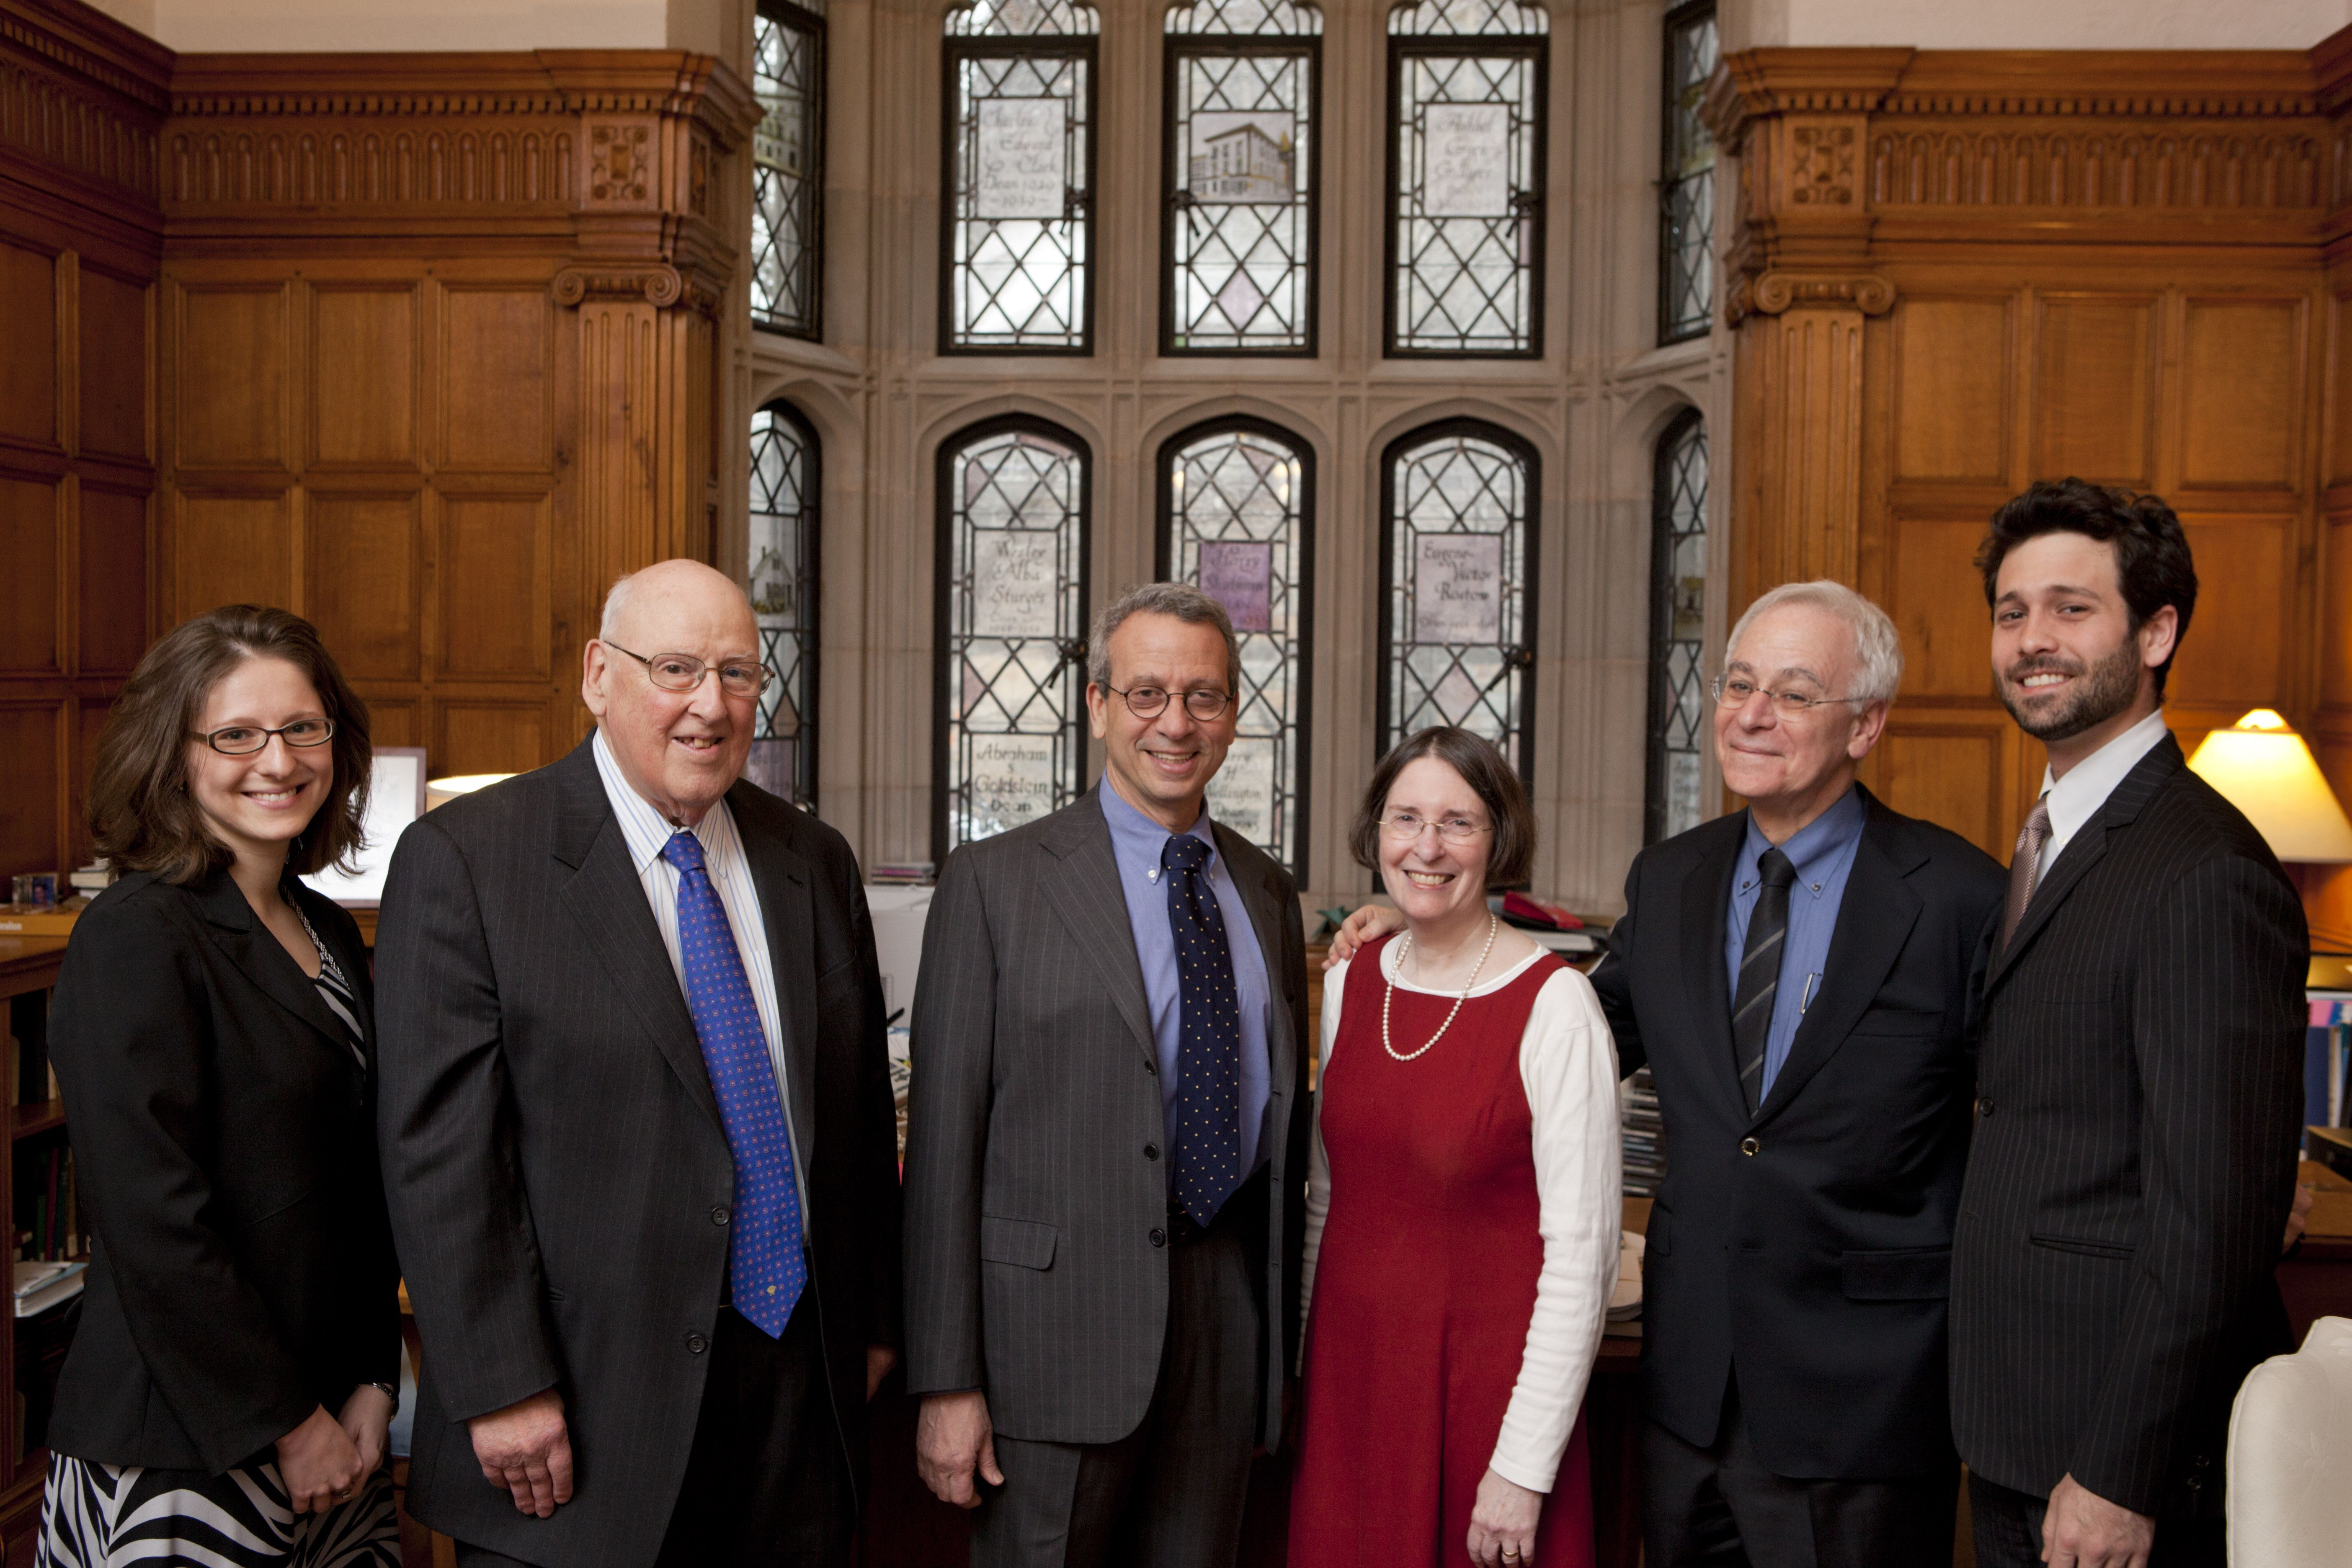 Natalya Shnitser '09, Judge Ralph Winter '60, MIT Econ. Prof. Stephen A. Ross, YLS Prof. and Center Dir. Roberta Romano '80, YLS Dean Robert Post '77, and Andrew Verstein '09